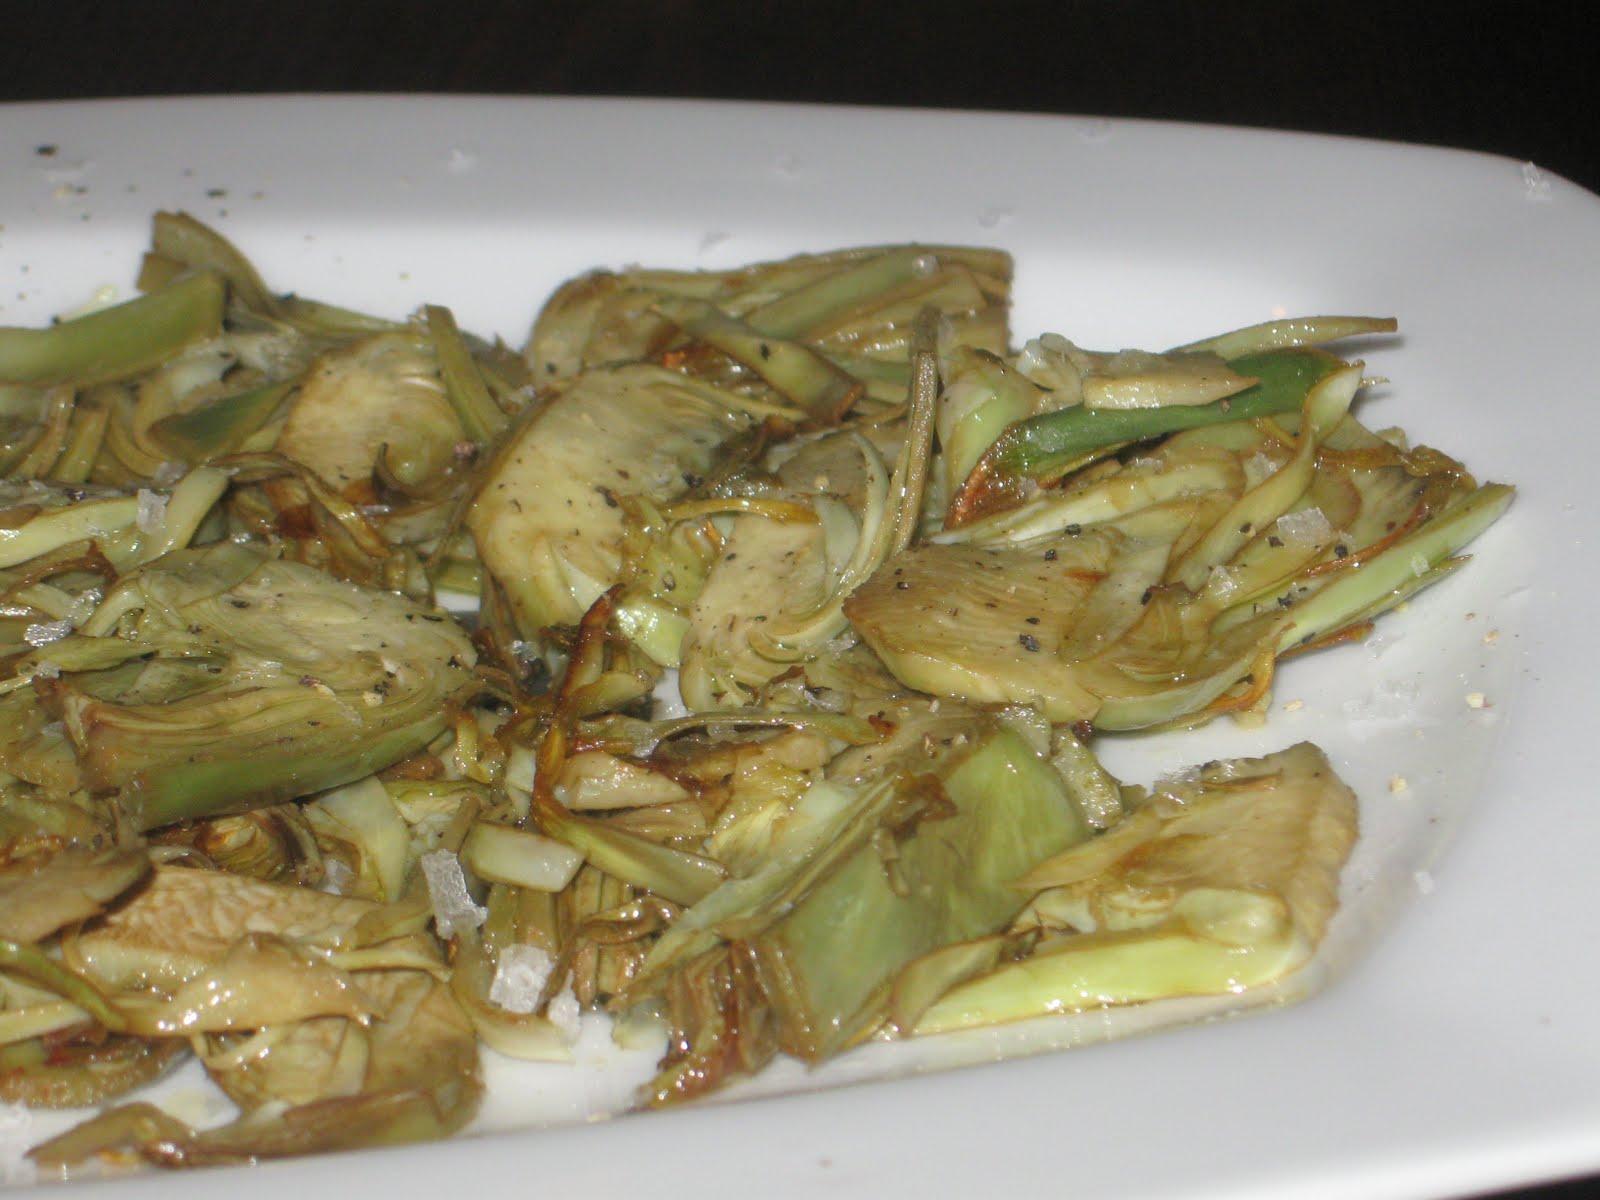 Cocina con quenyin alcachofas fileteadas a la plancha - Cocina con plancha ...